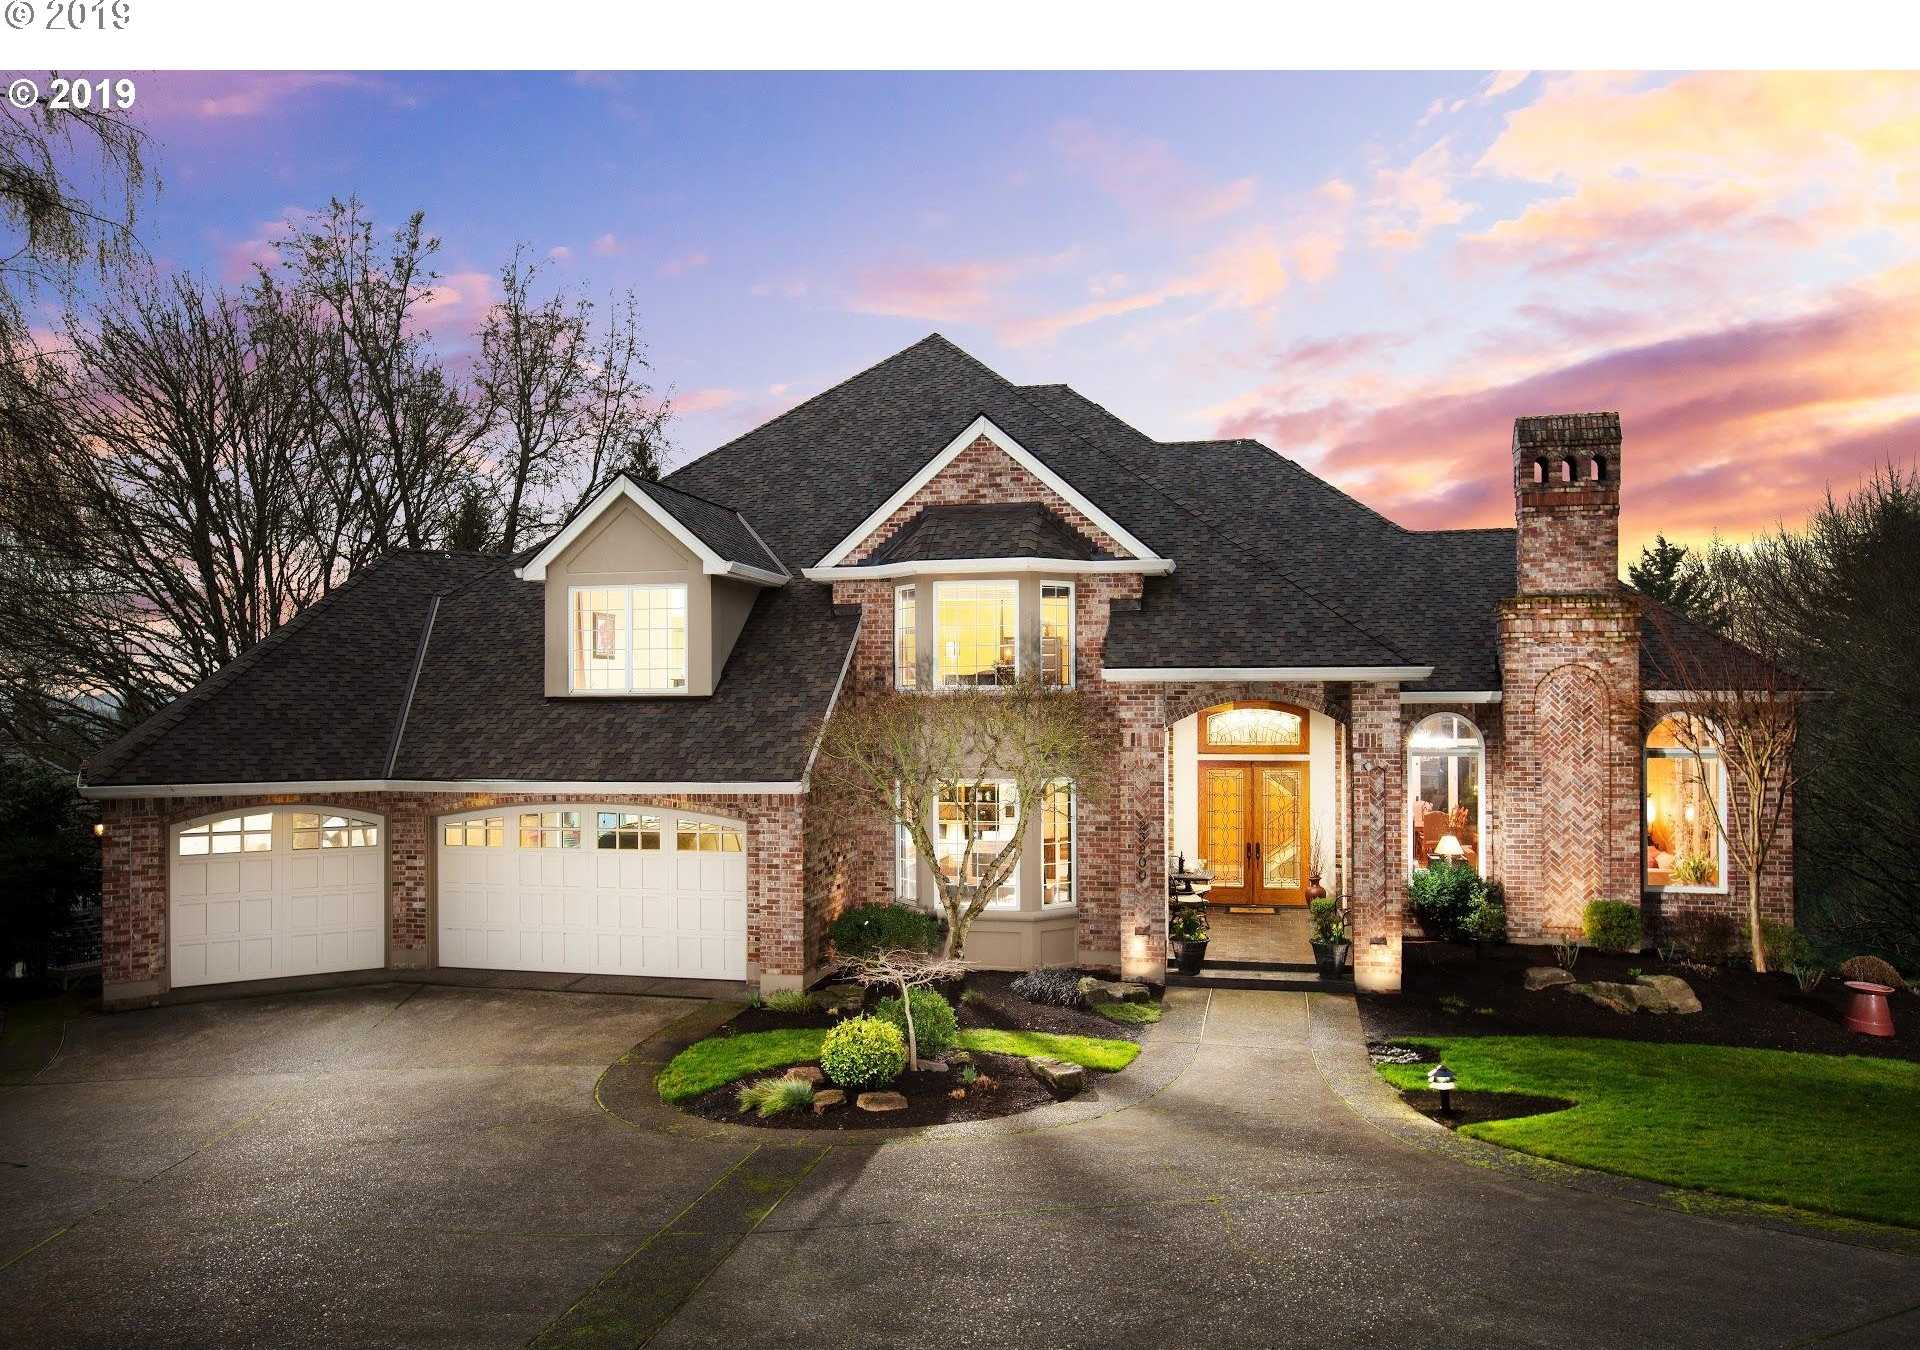 $1,750,000 - 5Br/5Ba -  for Sale in Stafford Hill Ranch, West Linn